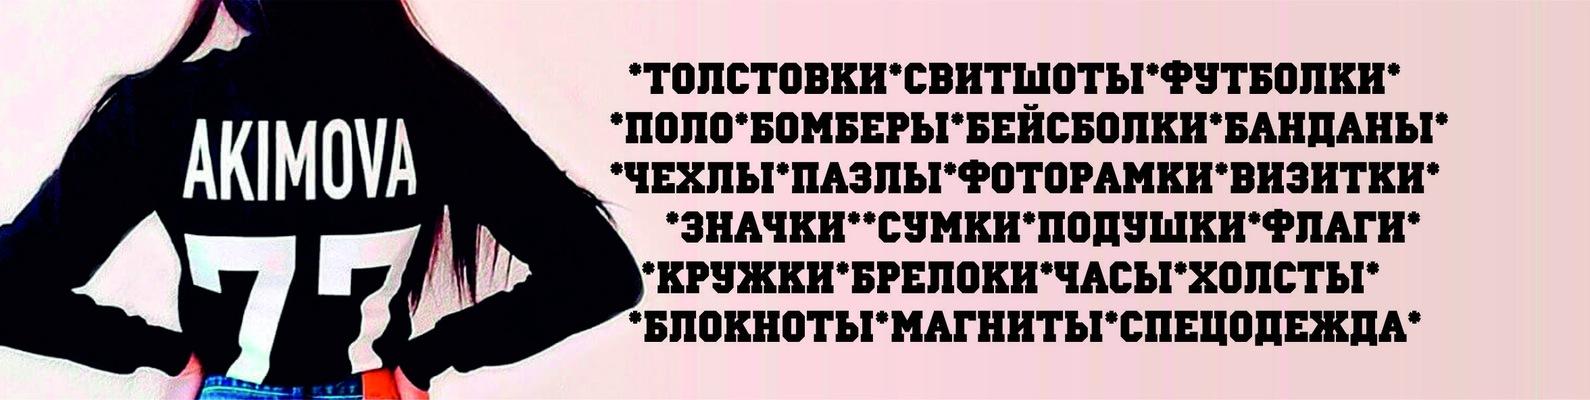 3d43616c7376 Футболки, толстовки, свитшоты на заказ Чебоксары | ВКонтакте